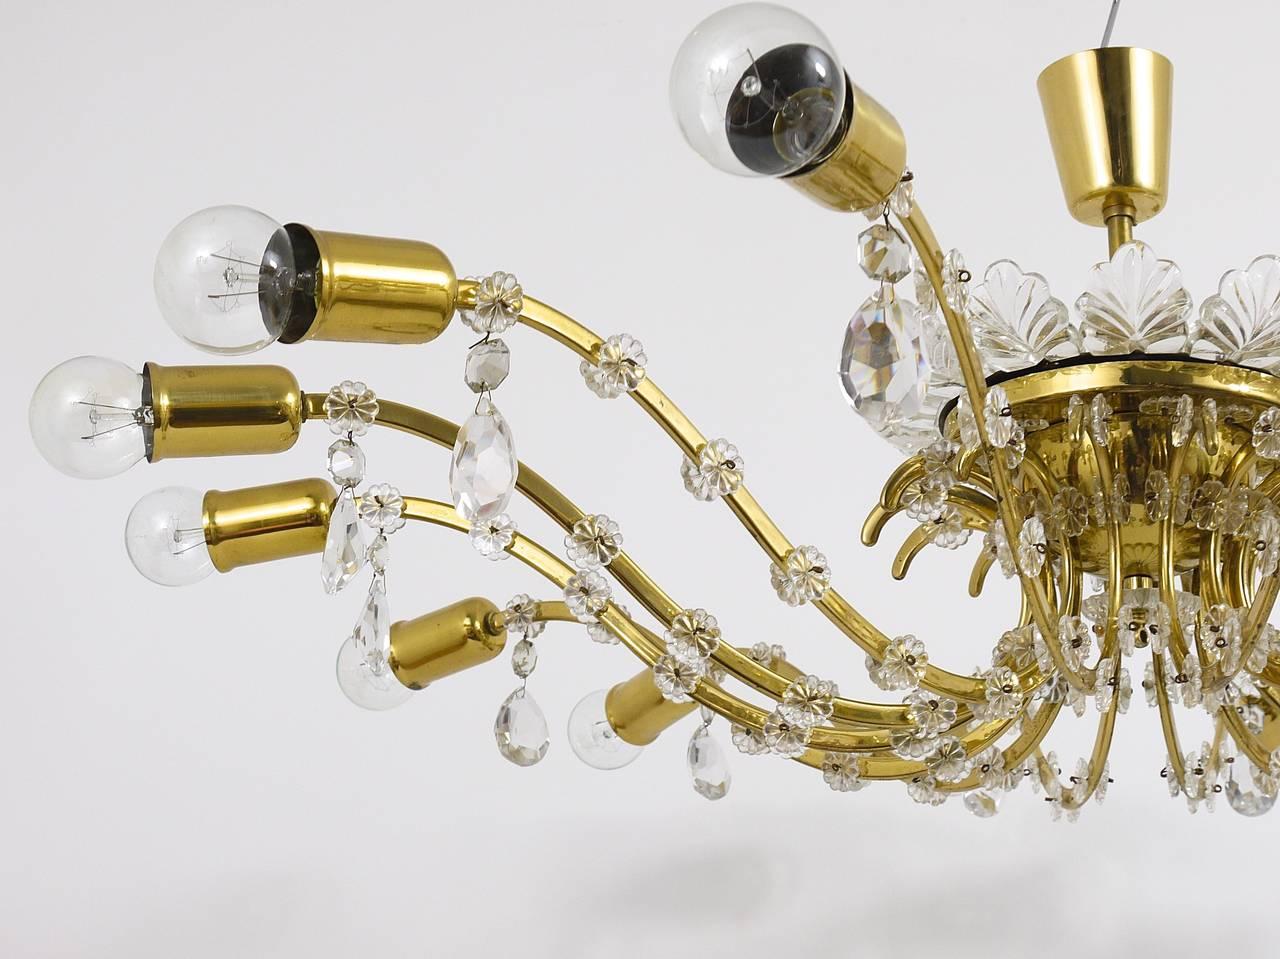 20th Century Huge Floral Lobmeyr Mid-Century Brass Crystal Chandelier, 1950s, Austria For Sale